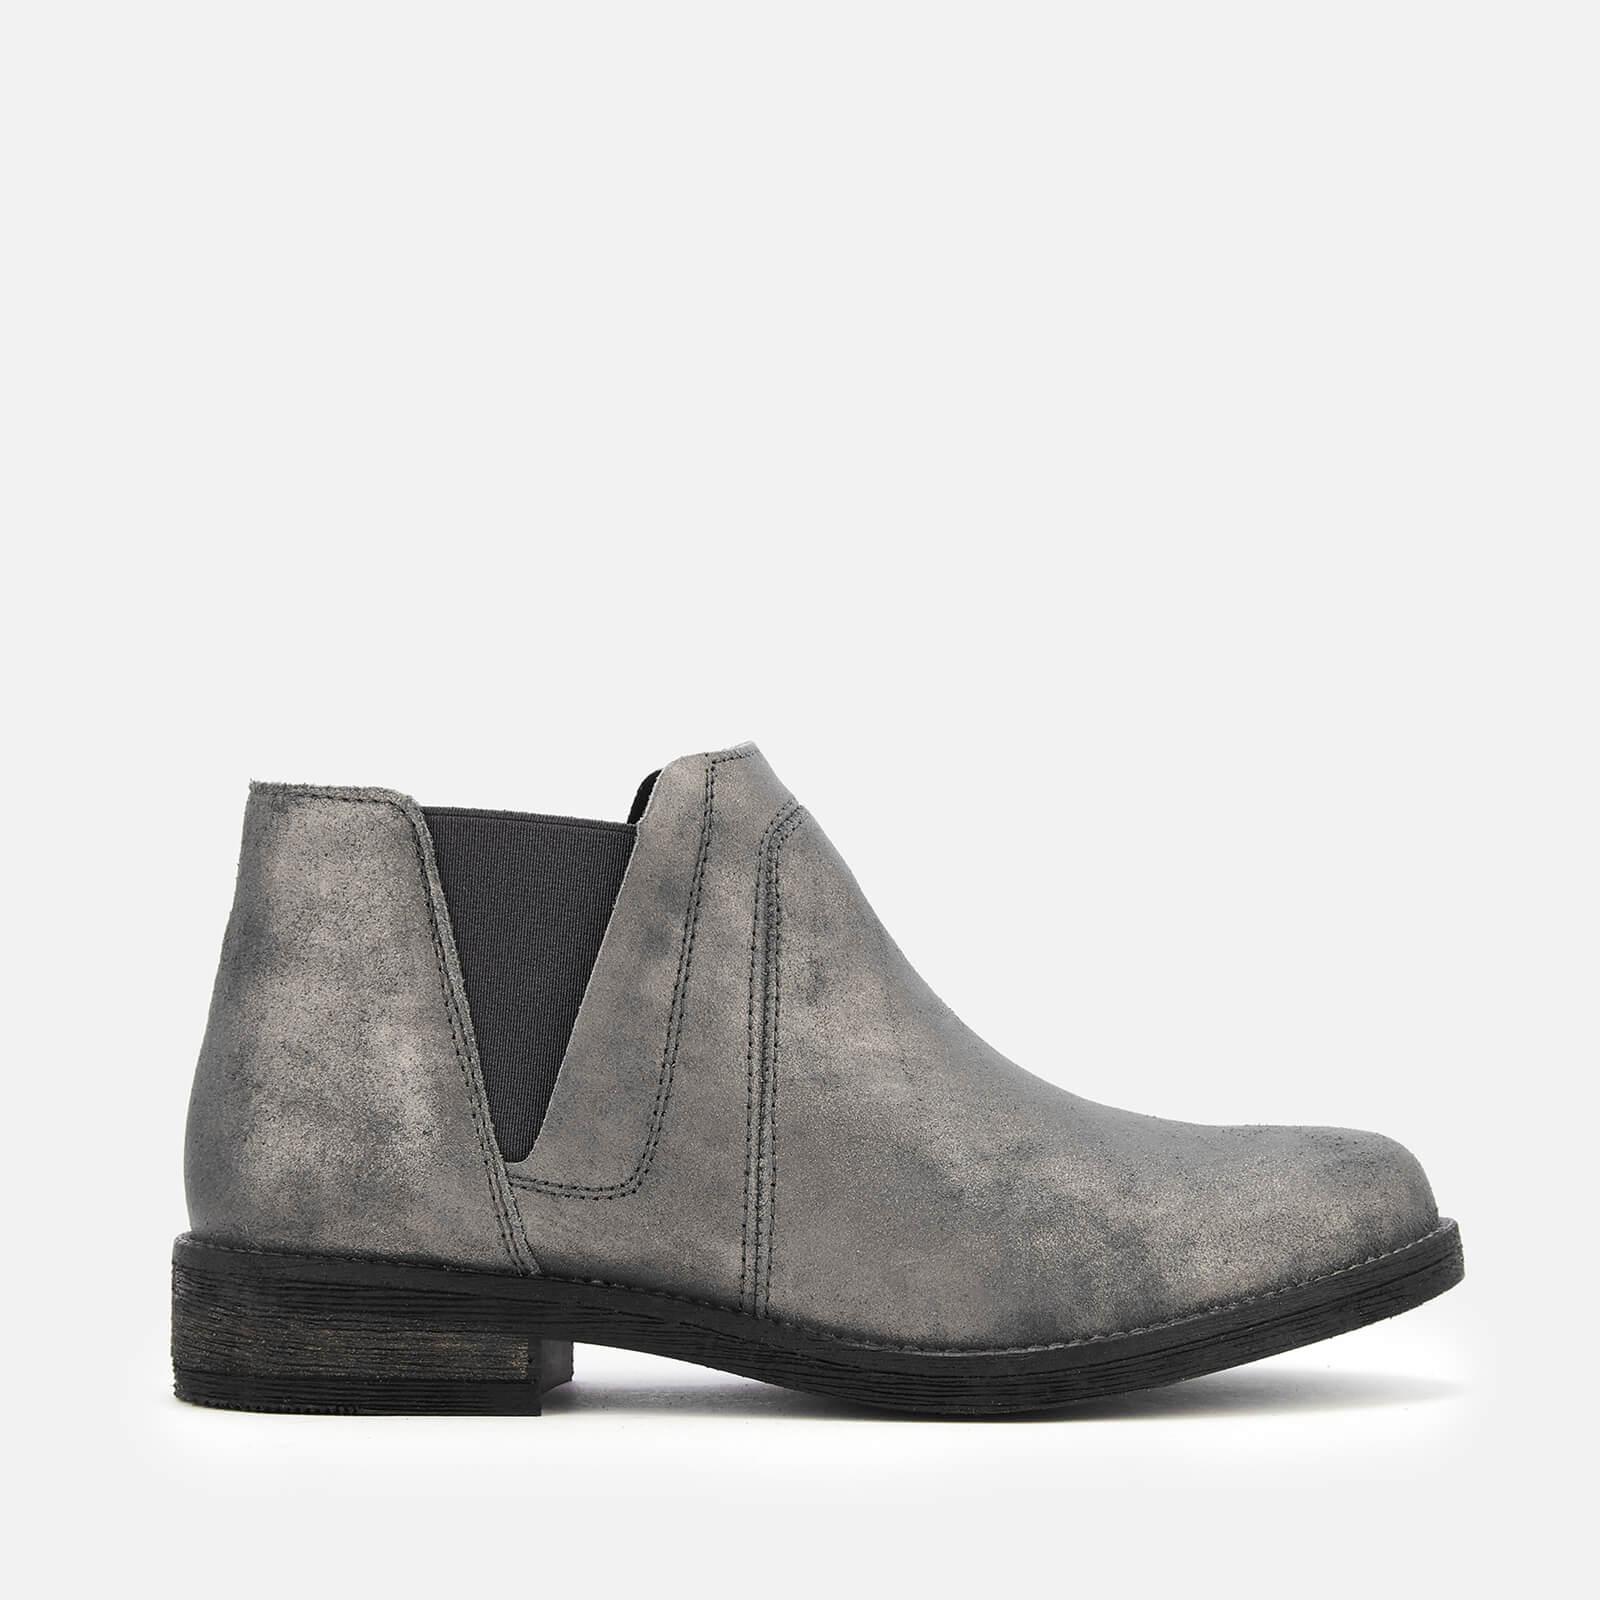 Clarks Women's Demi Beat Suede Ankle Boots - Dark Grey - UK 6 - Grey